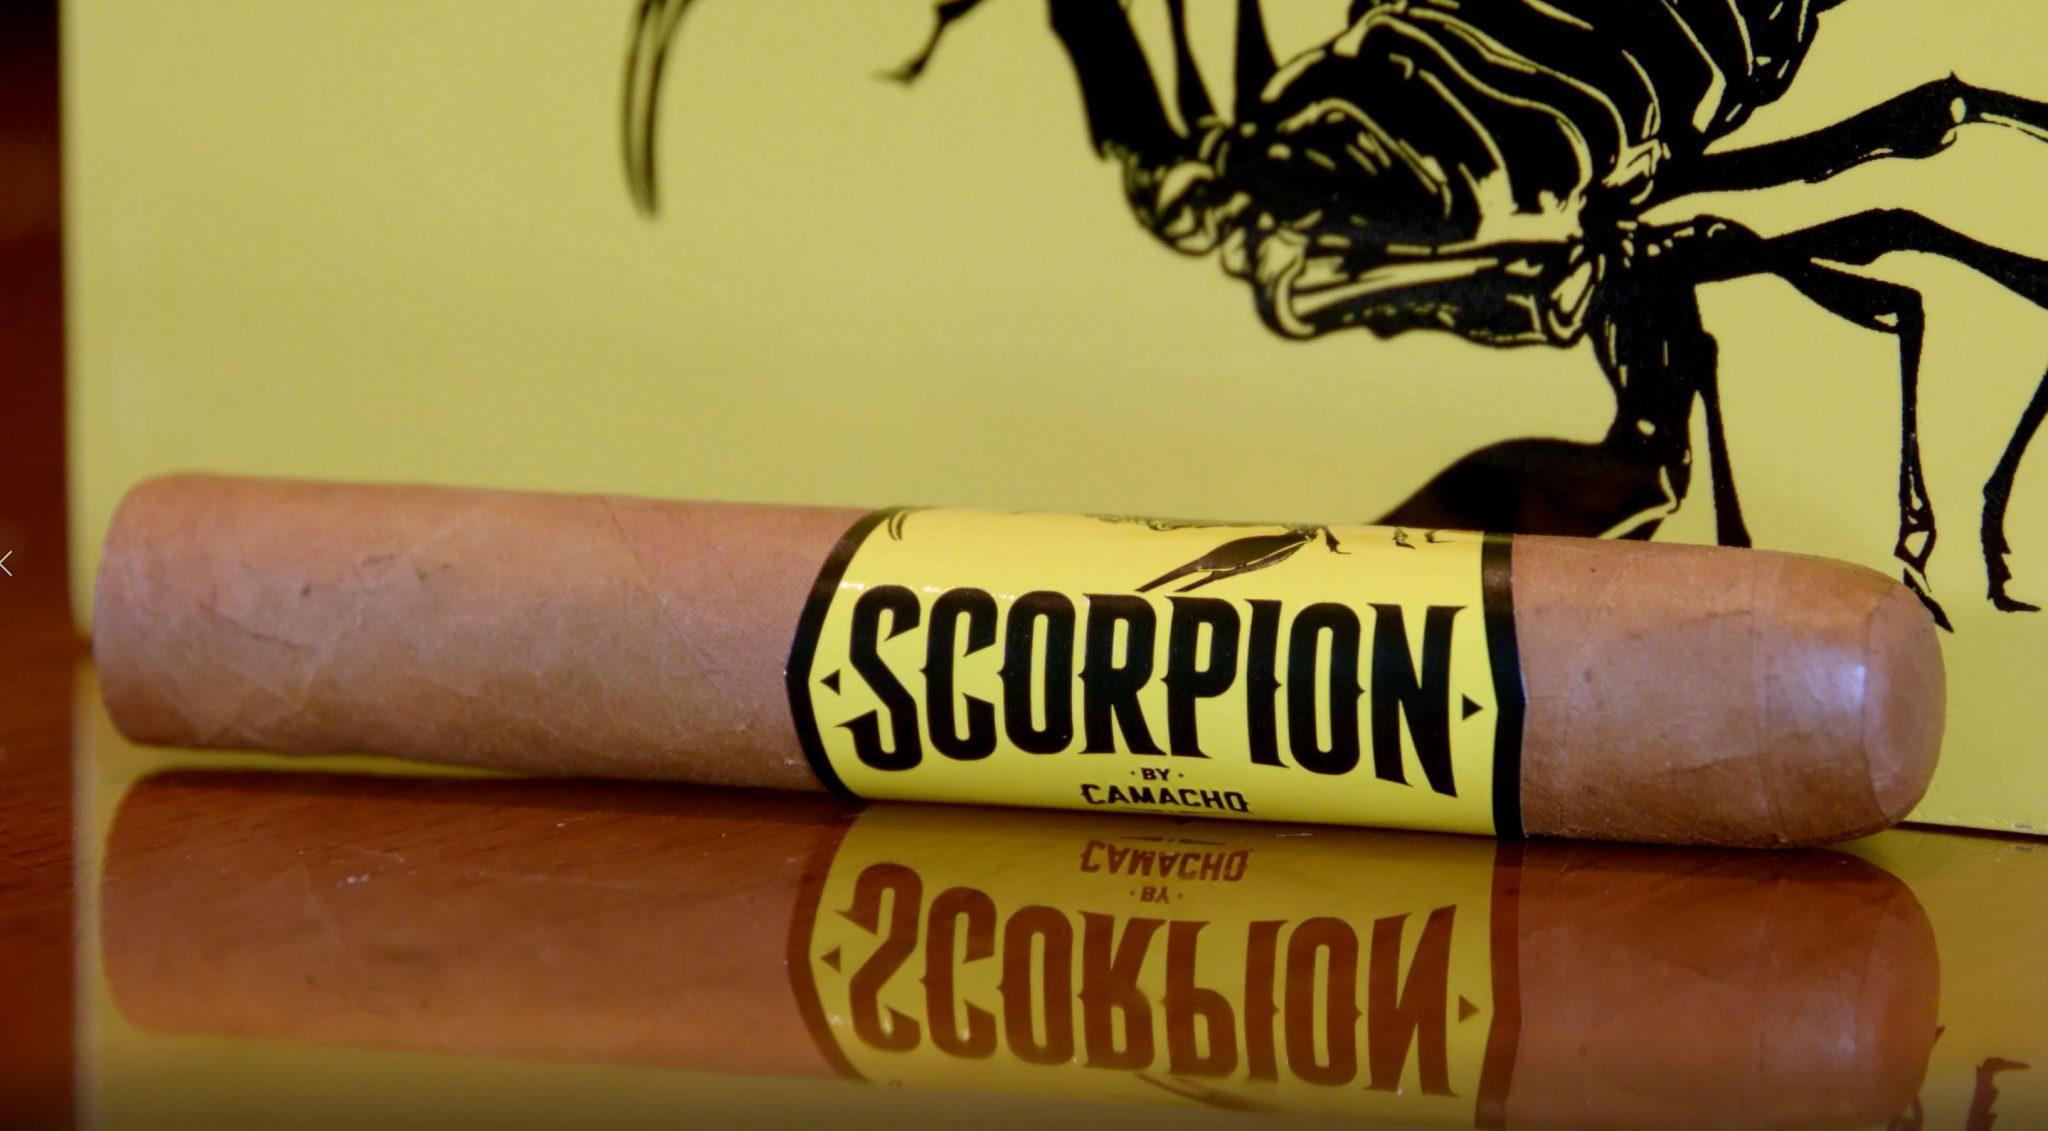 camacho scorpion connecticut cigar review video unlit Camacho Scorpion cigar at Famous Smoke Shop